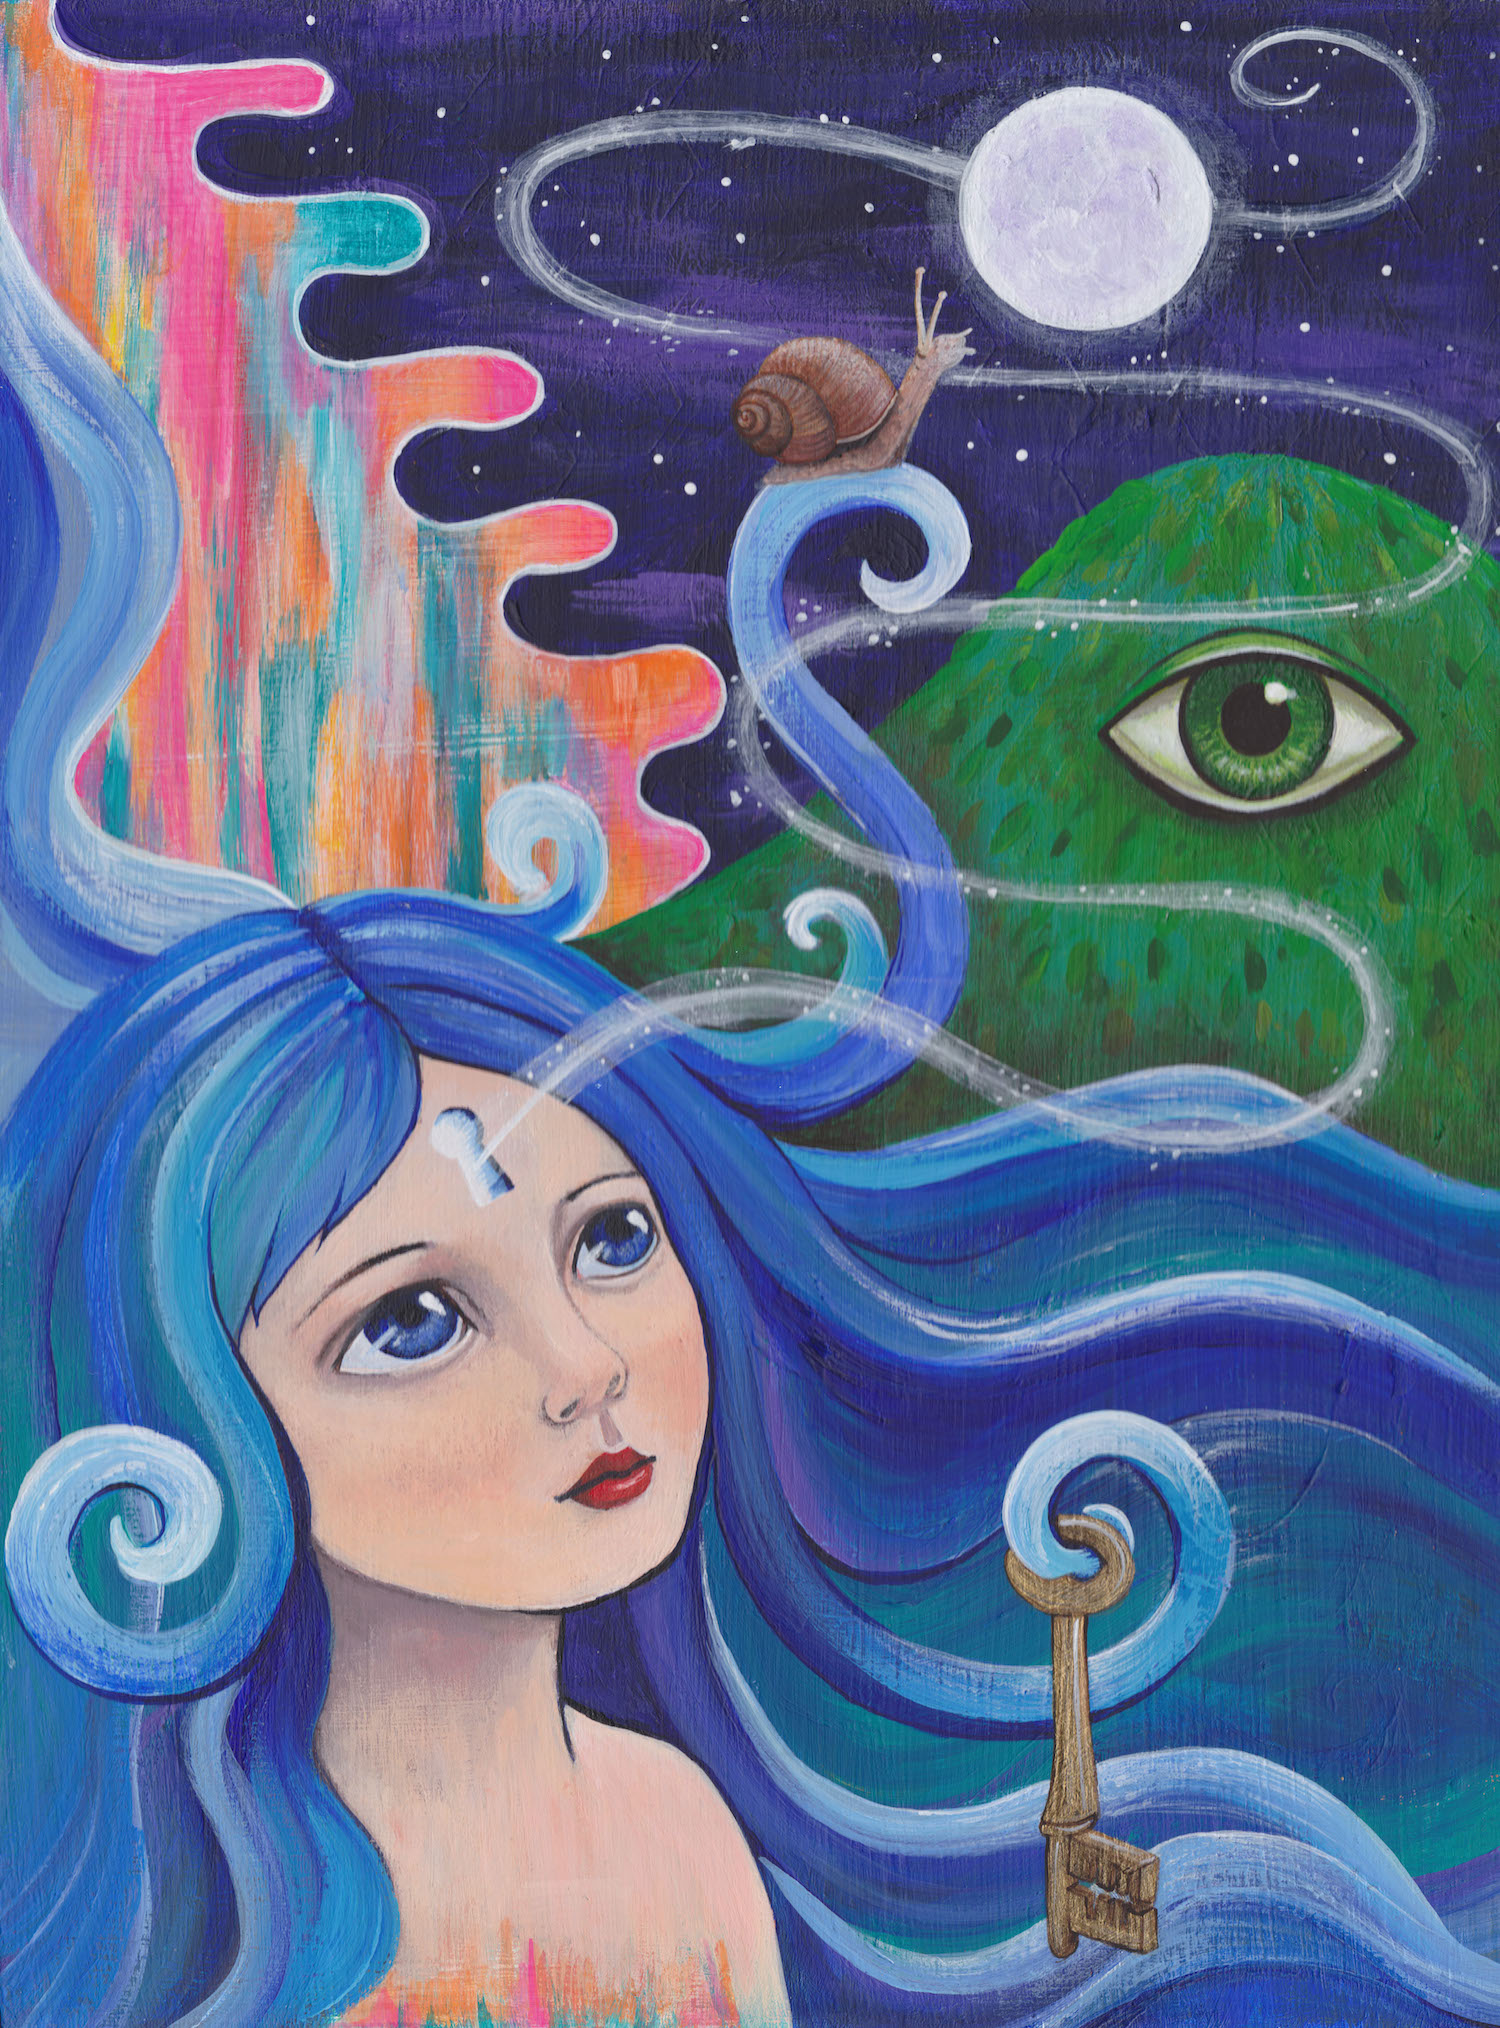 Faerie sarah art, sarah kilgariff artist, melbourne artist, visionary art